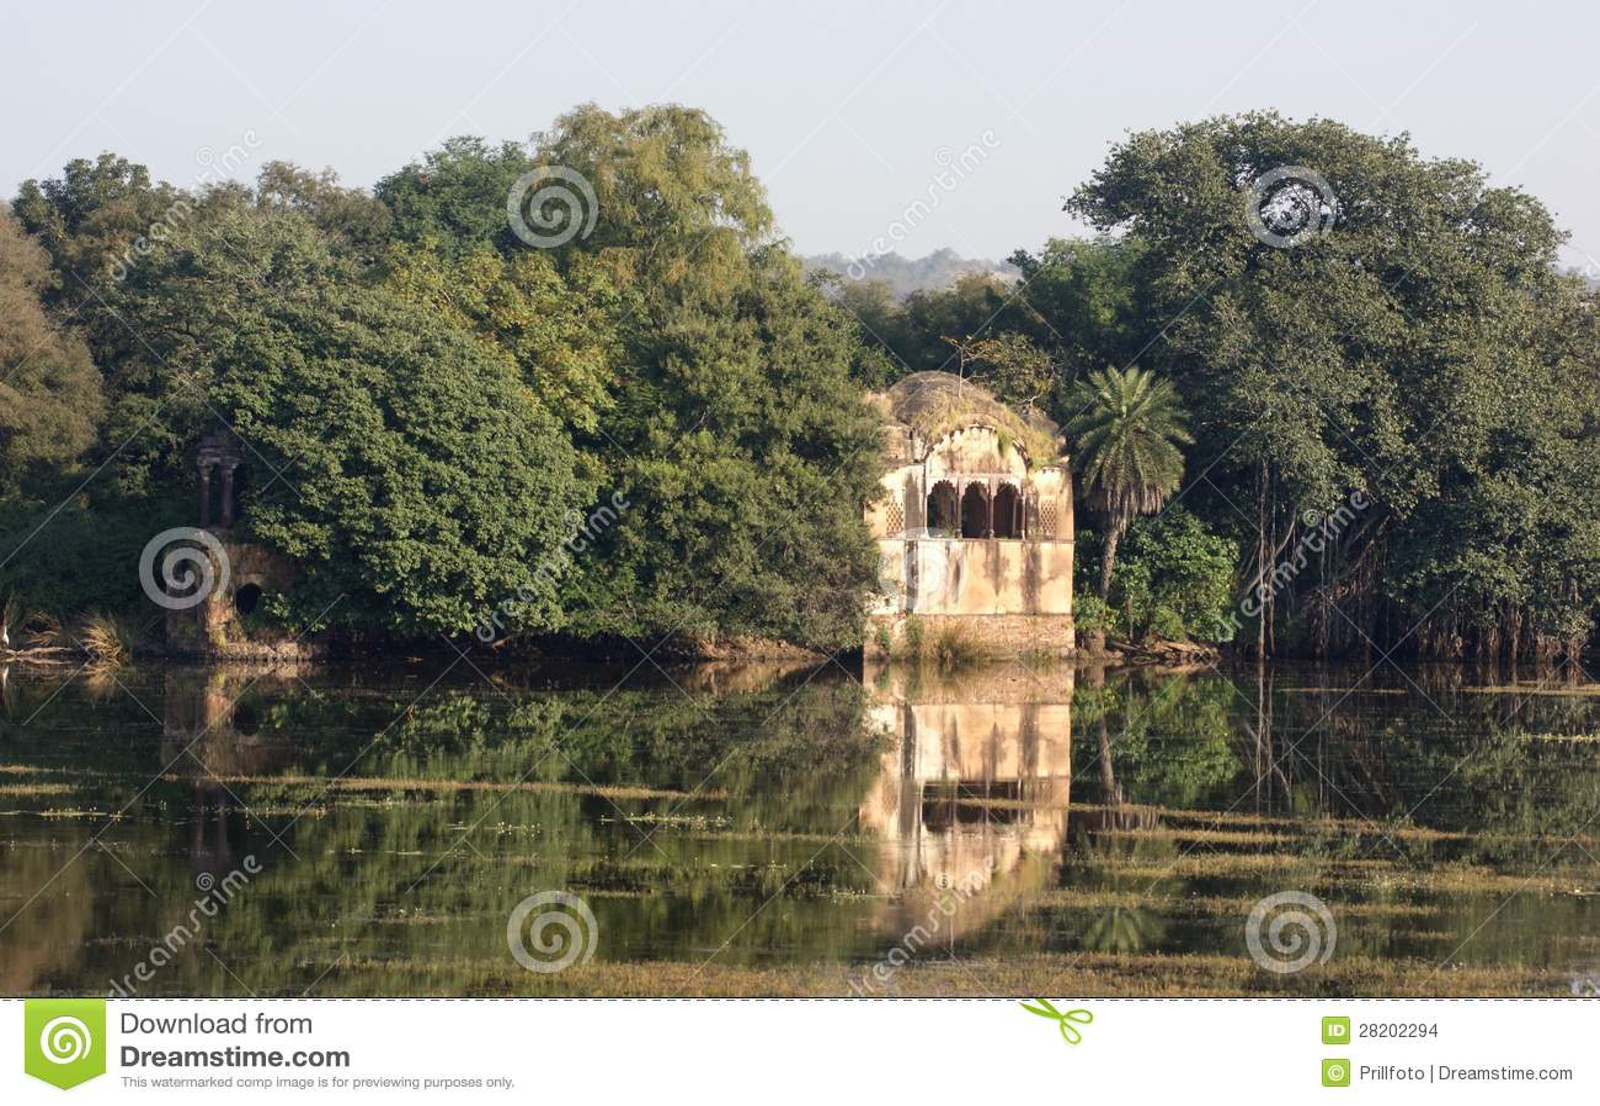 Download Ranthambore National Park stock photo. Image of lake - 28202294